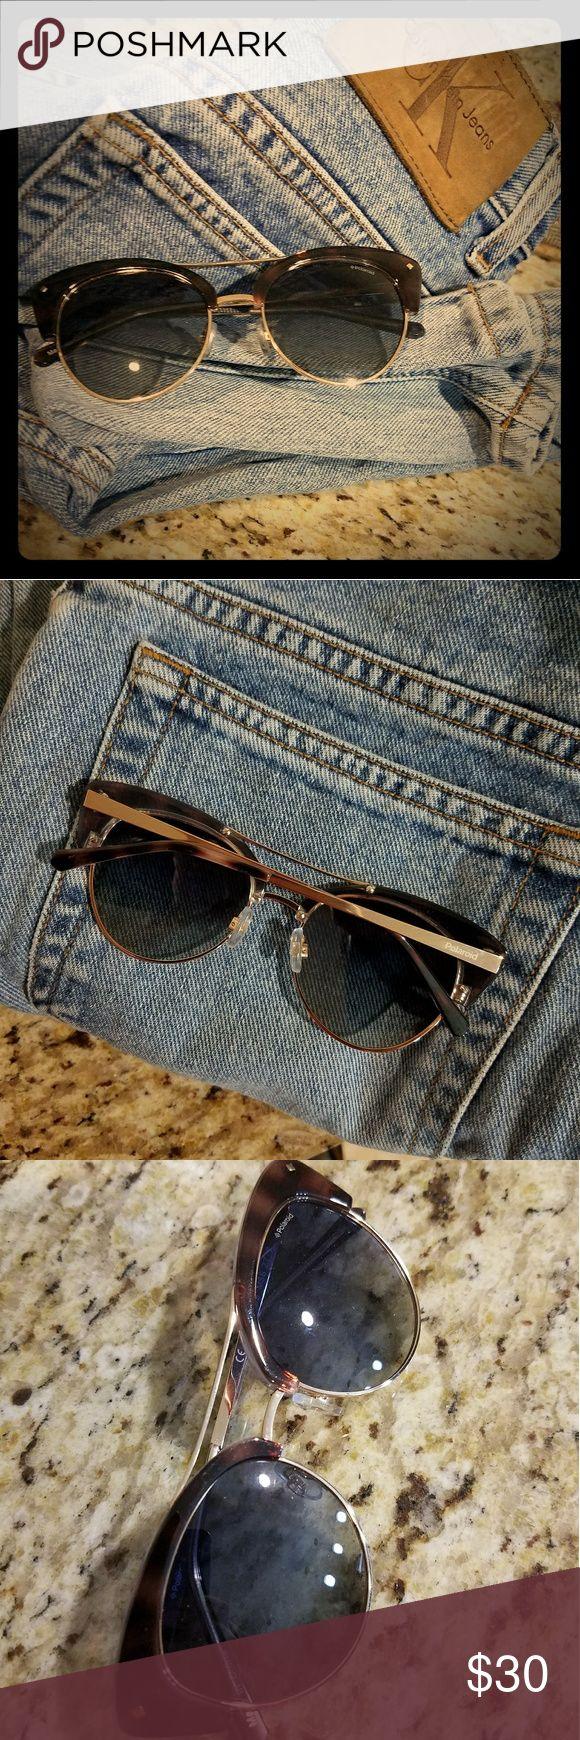 Polaroid Sunglasses gold frame blue lens Hard to find Polaroid sunglasses! No major scratches or problems! polaroid Accessories Glasses